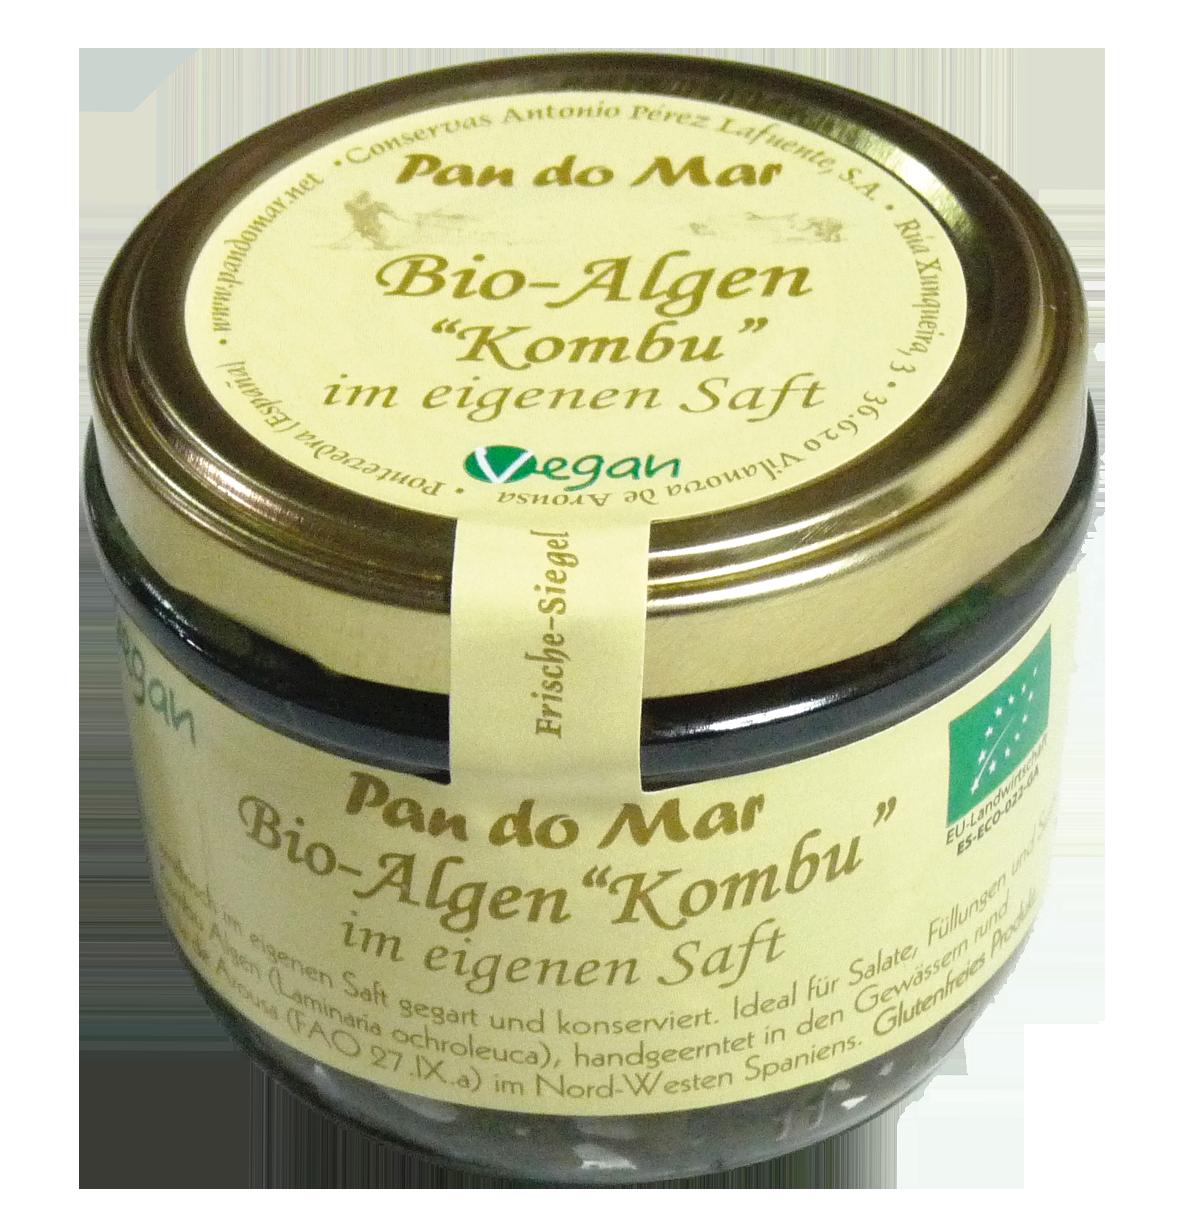 "Bio-Algen ""Kombu"" -im eigenen Saft-"